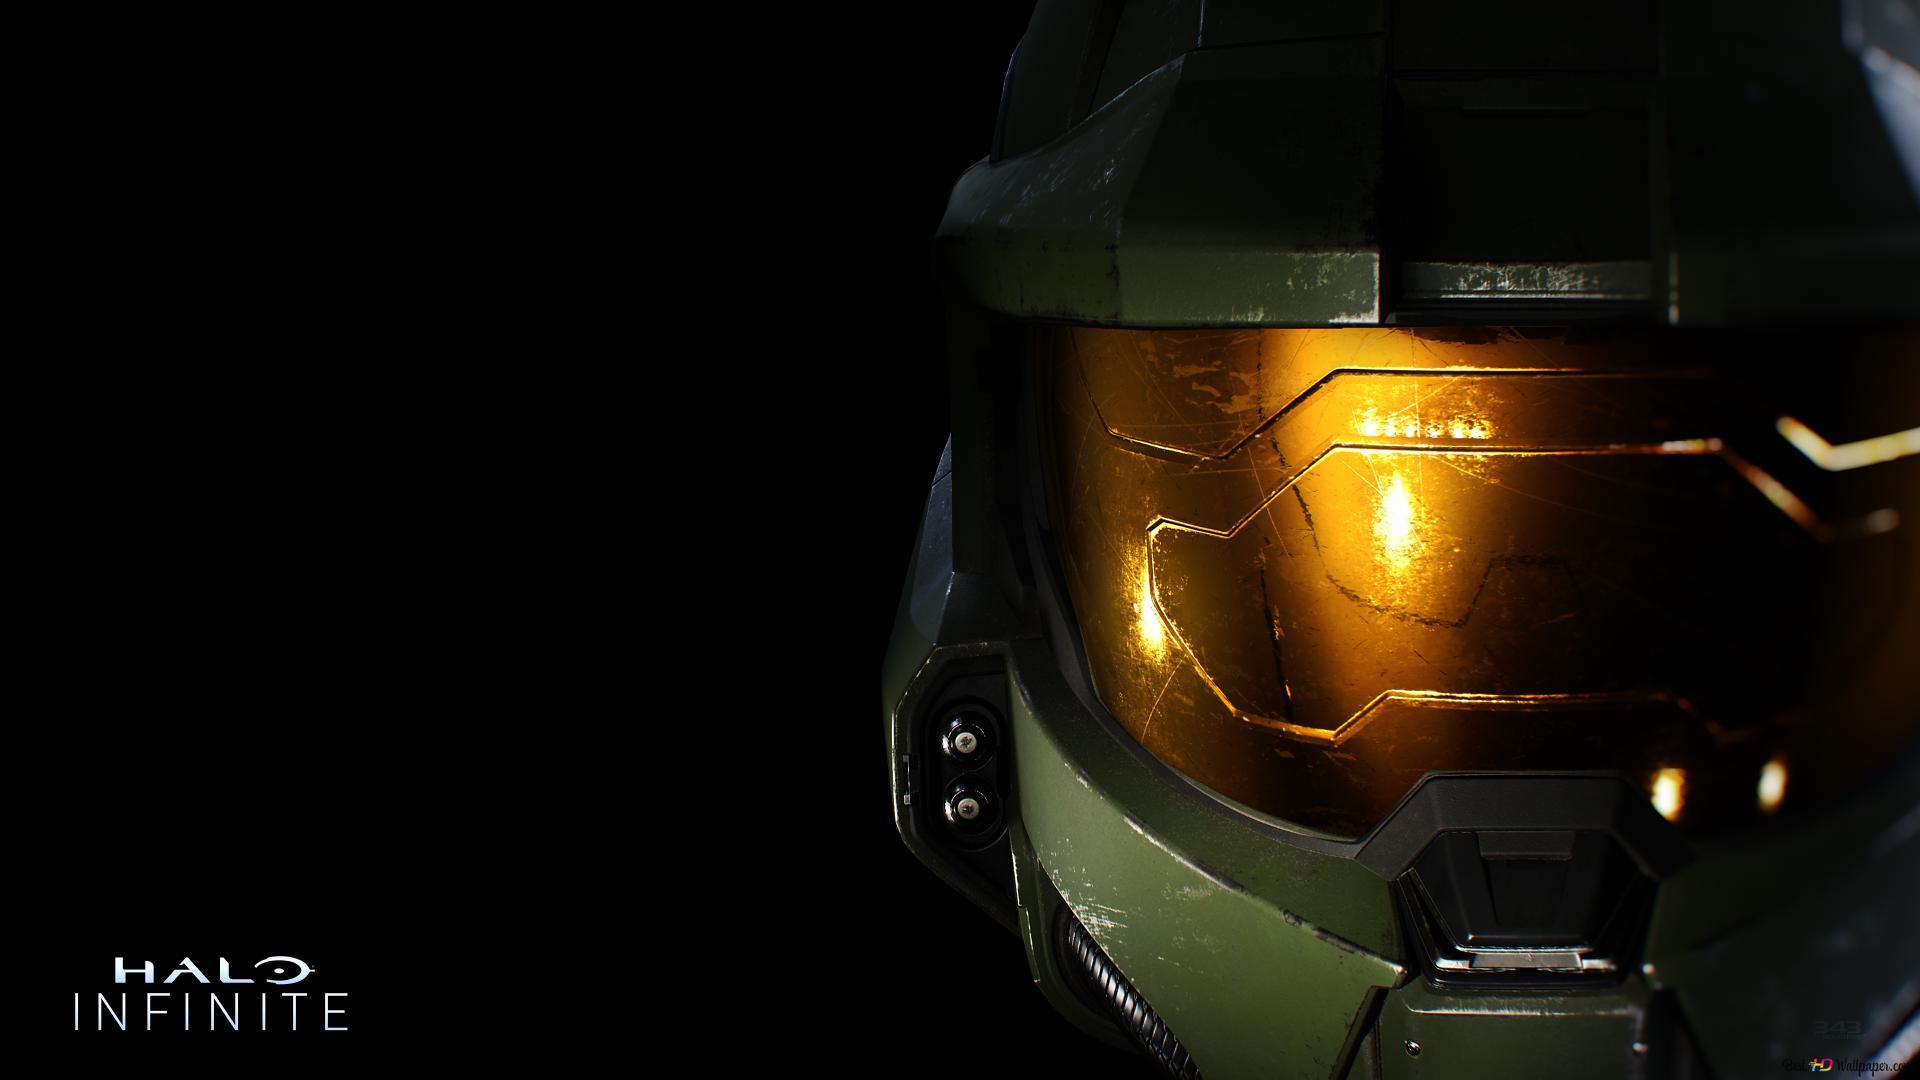 Halo Infinite Hd Wallpaper Download